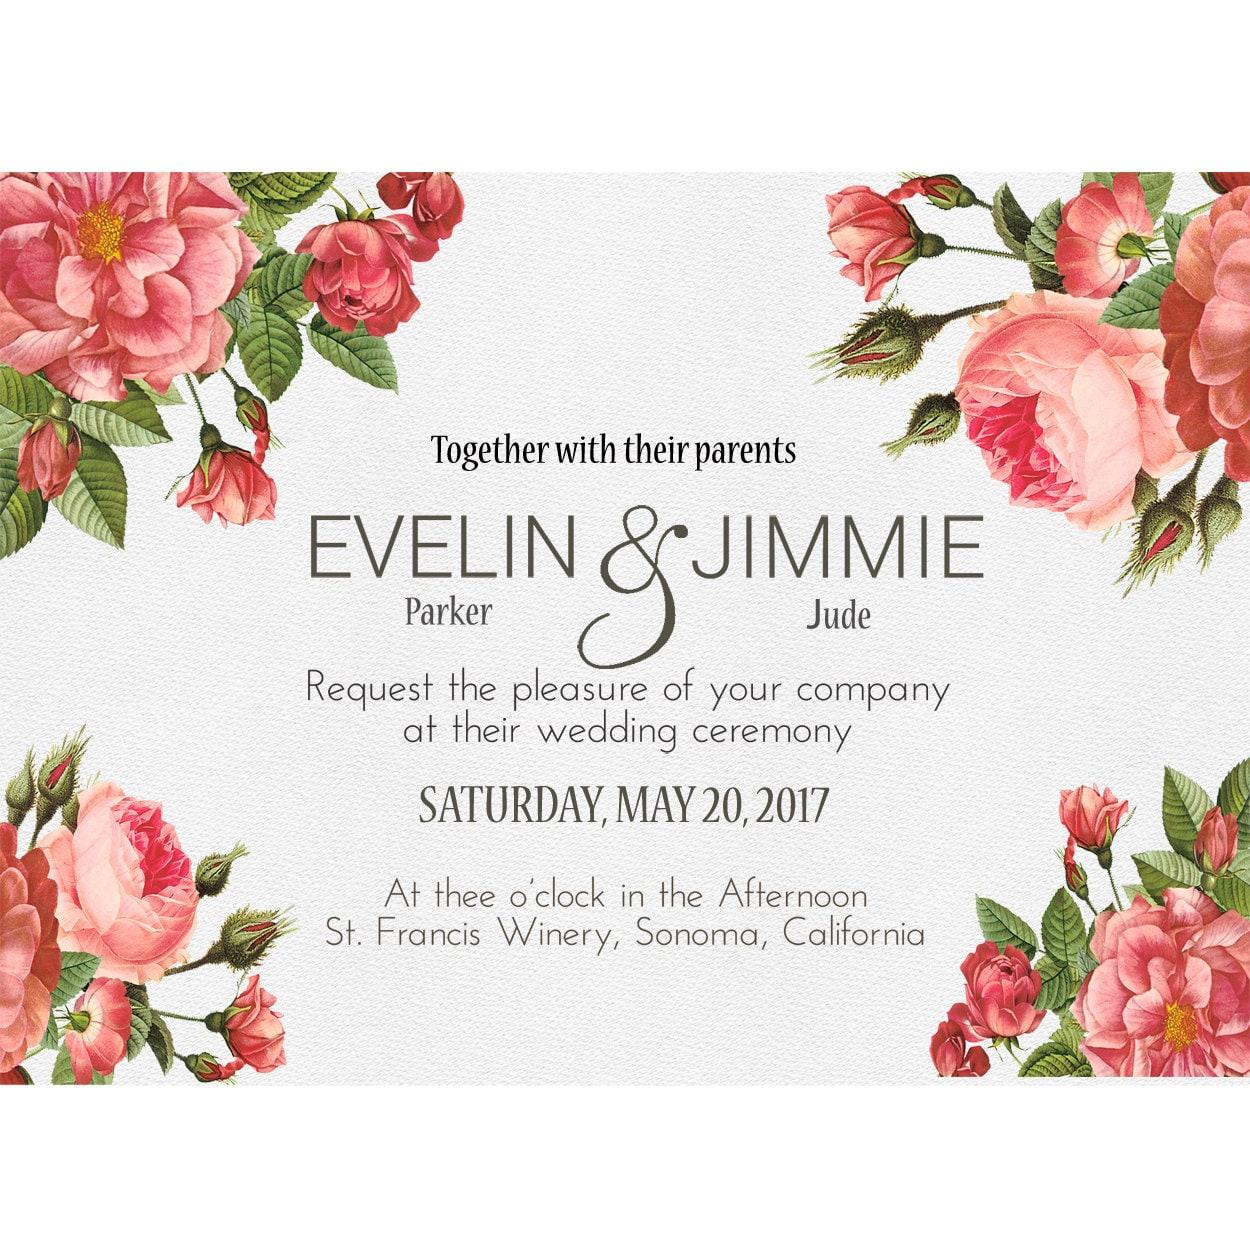 Wedding Invitations | French Strawberry Pink Floral Invitation ...